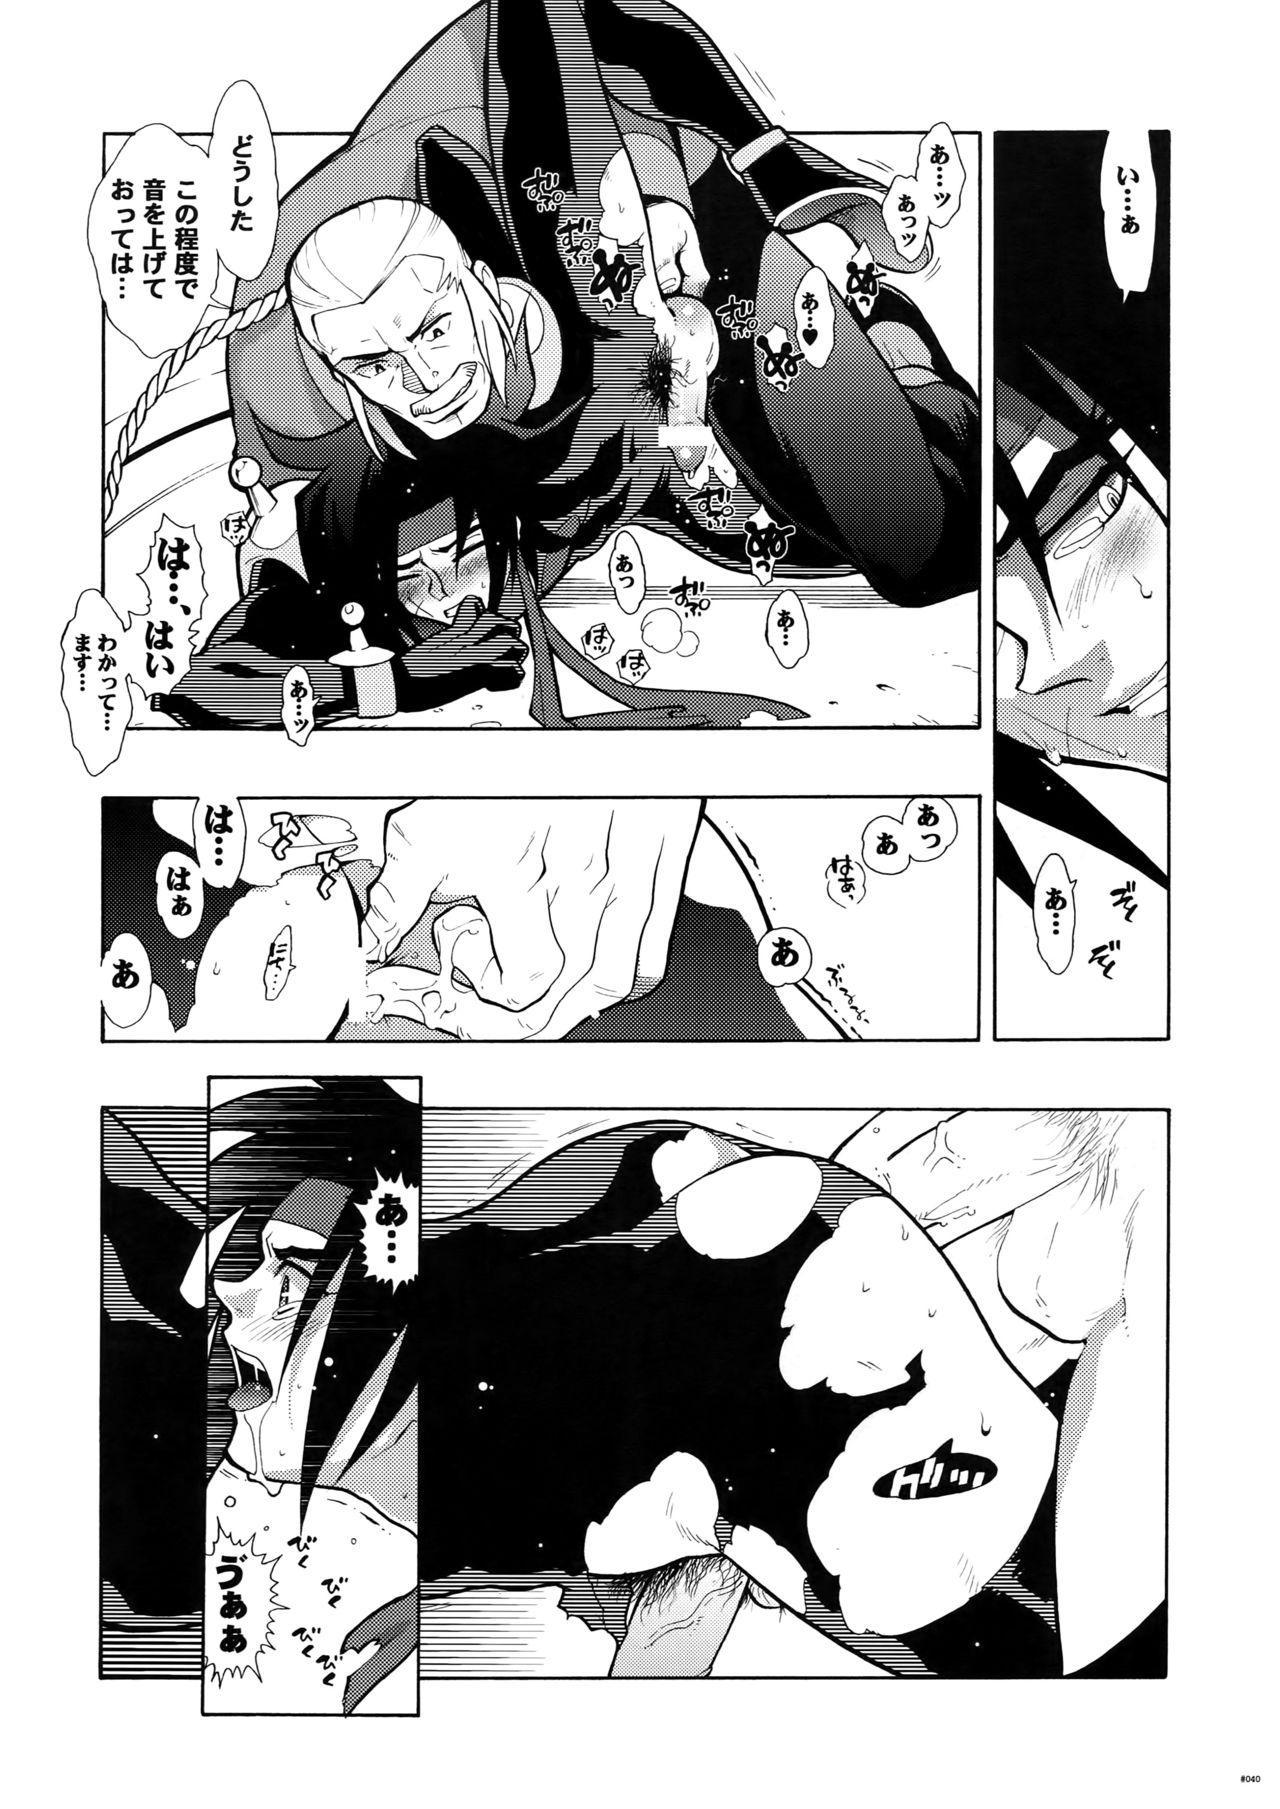 [Article 60 of Criminal Code (Shuhan)] G-gan Josei-Muke Sairoku-Shuu (G Gundam) 39